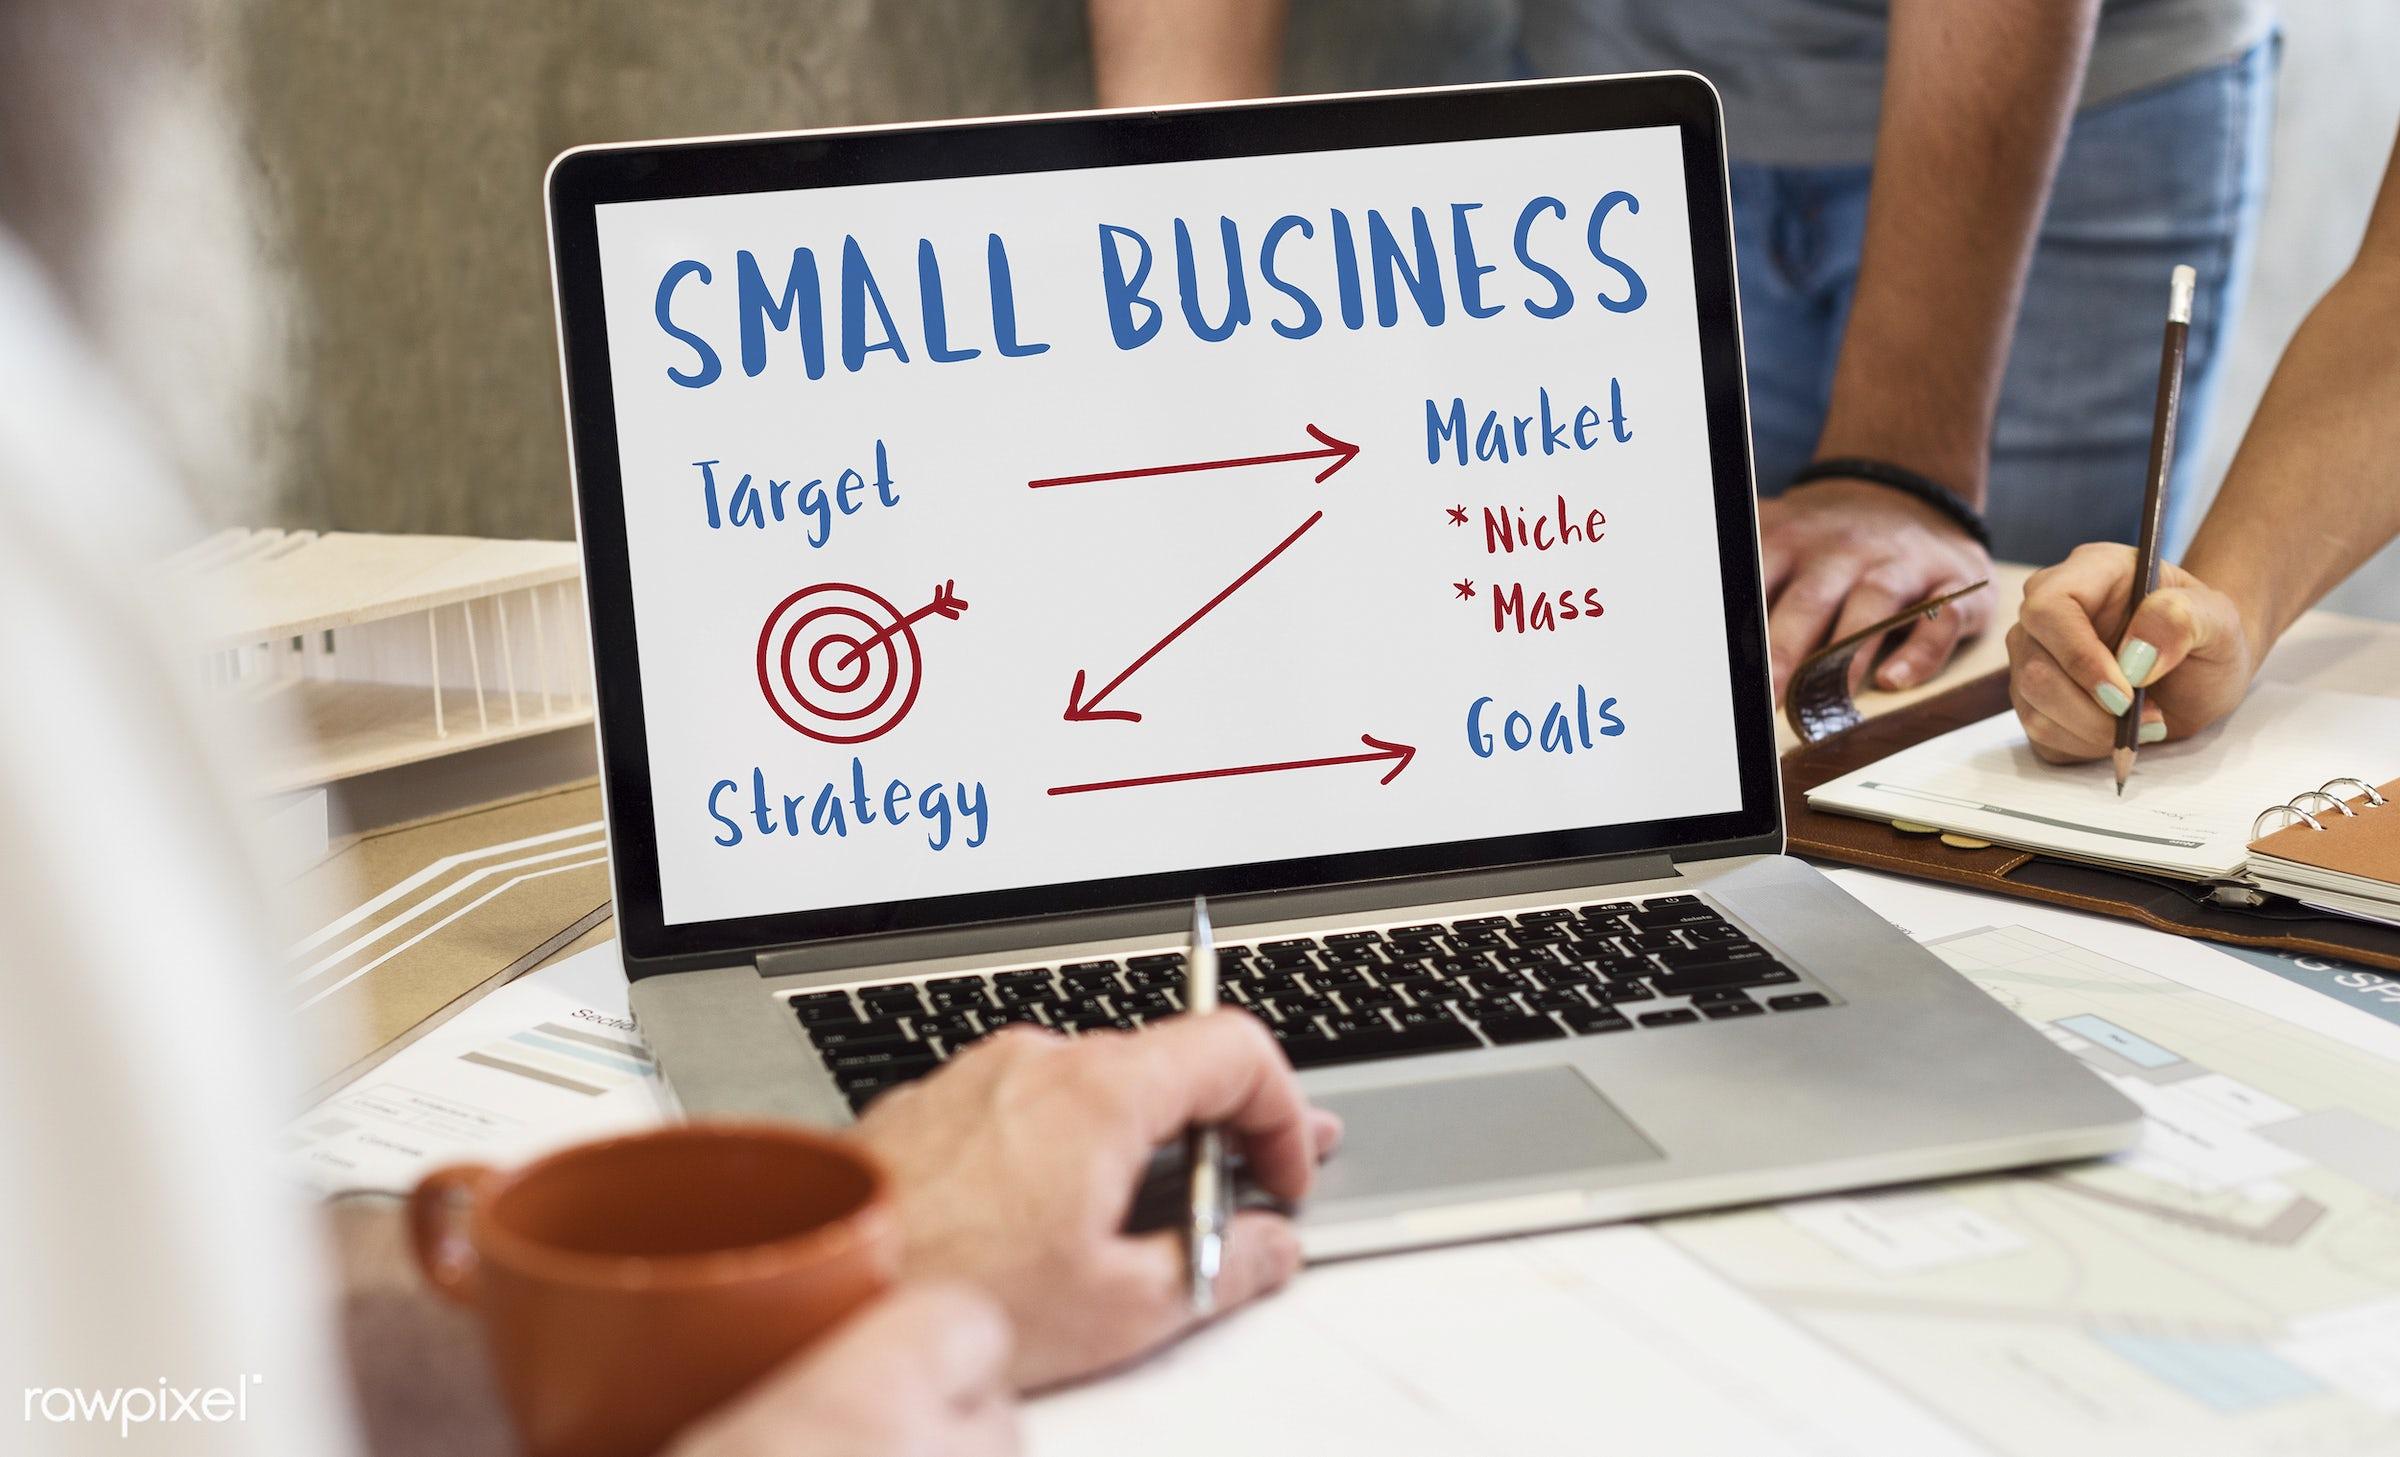 architect, architecture, b2b, brainstorming, business, business to business, coffee, coffee cup, cup, dart, designed, device...